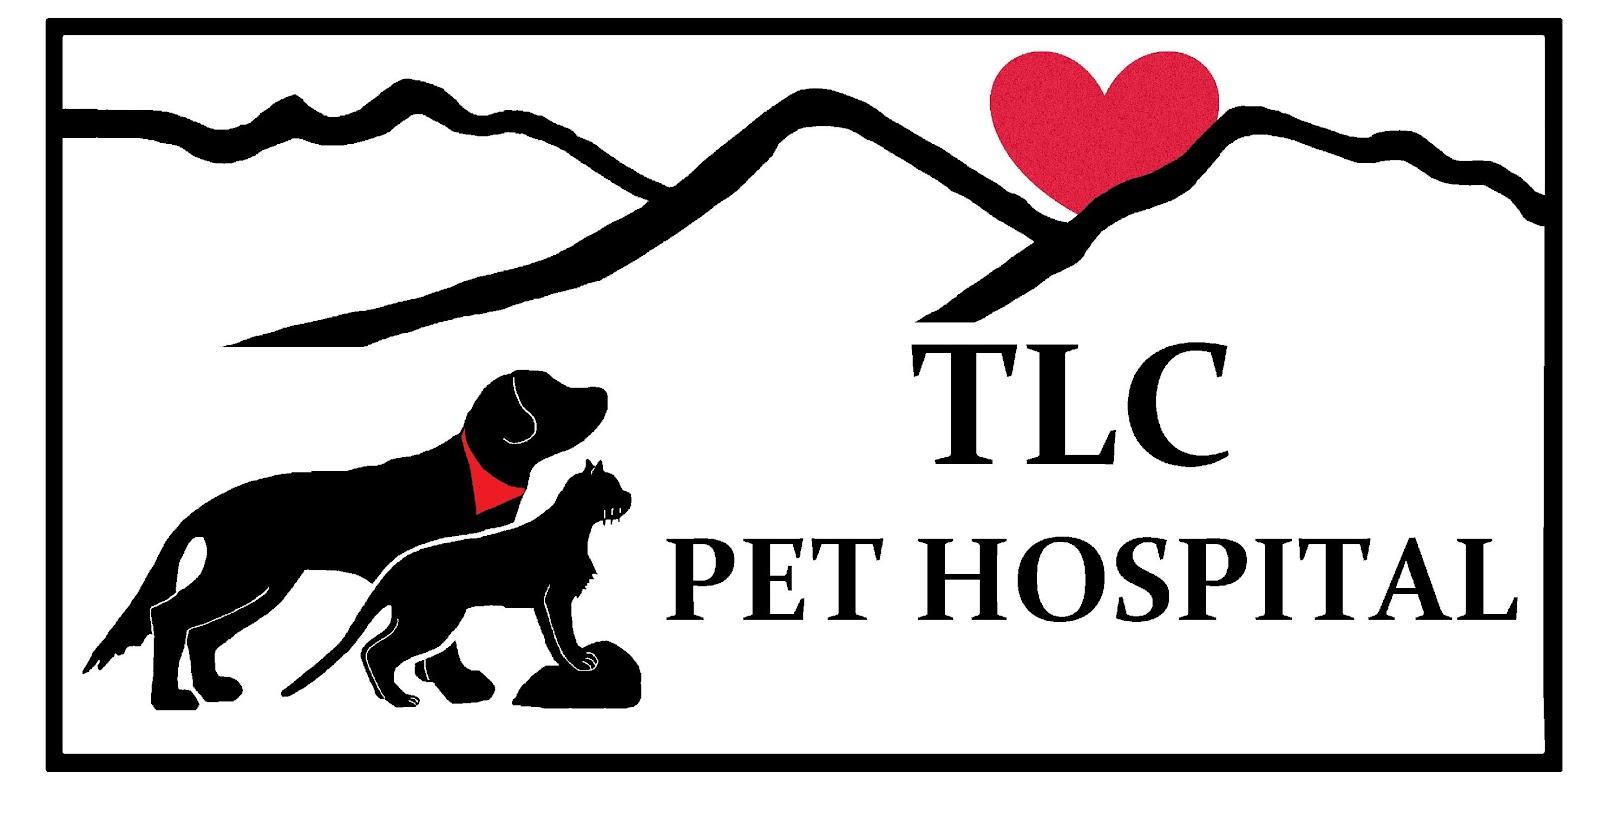 C:\Users\jvosburgh\Dropbox\Jogathon\2018 sponsor logos\TLC Pet Hospital.jpg